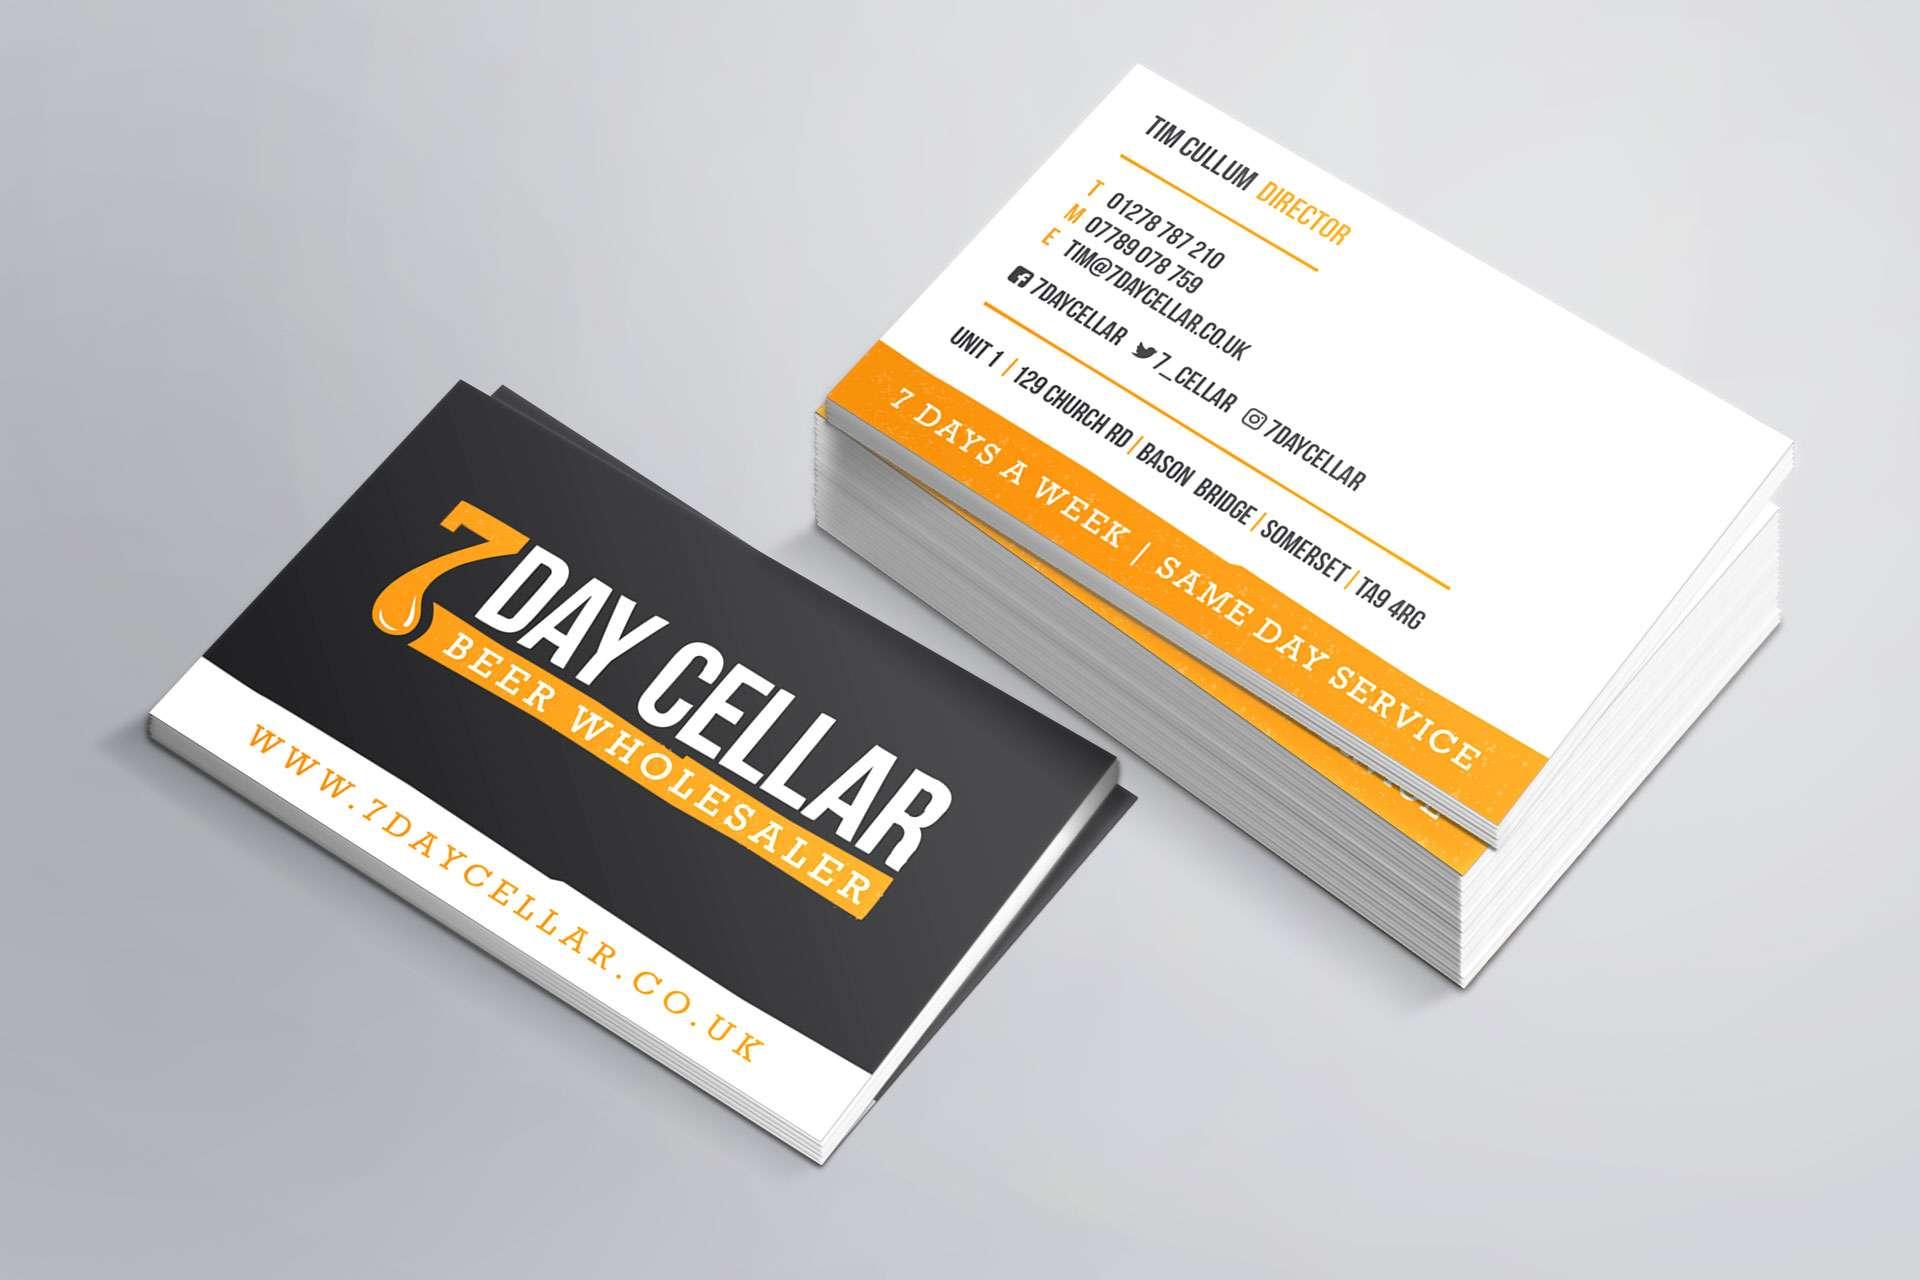 7 Day Cellar business card design, Somerset